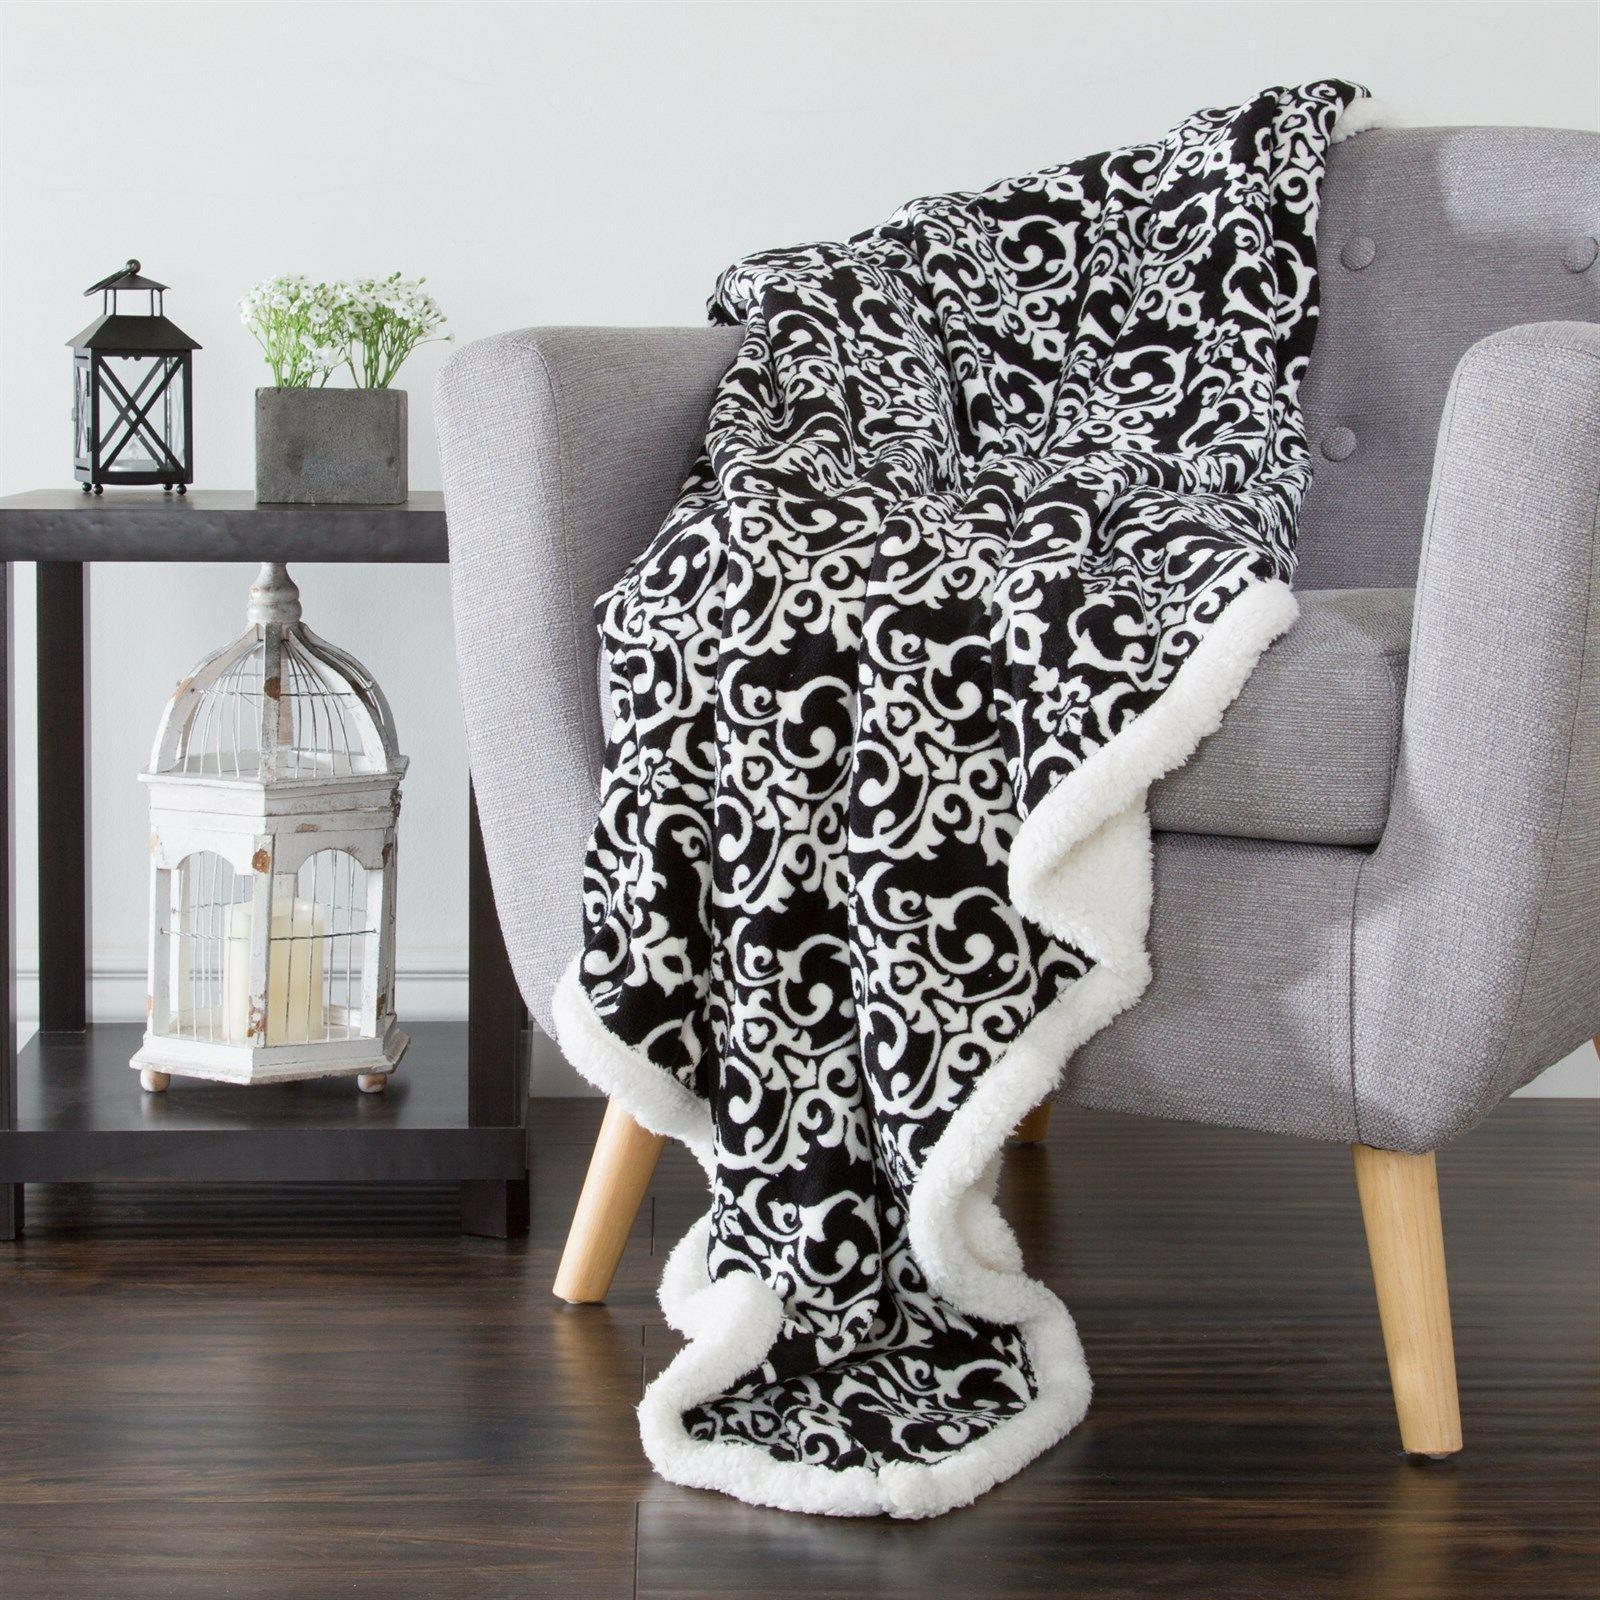 Lavish Home Fleece Sherpa Throw Blanket 50 x 60 Inches